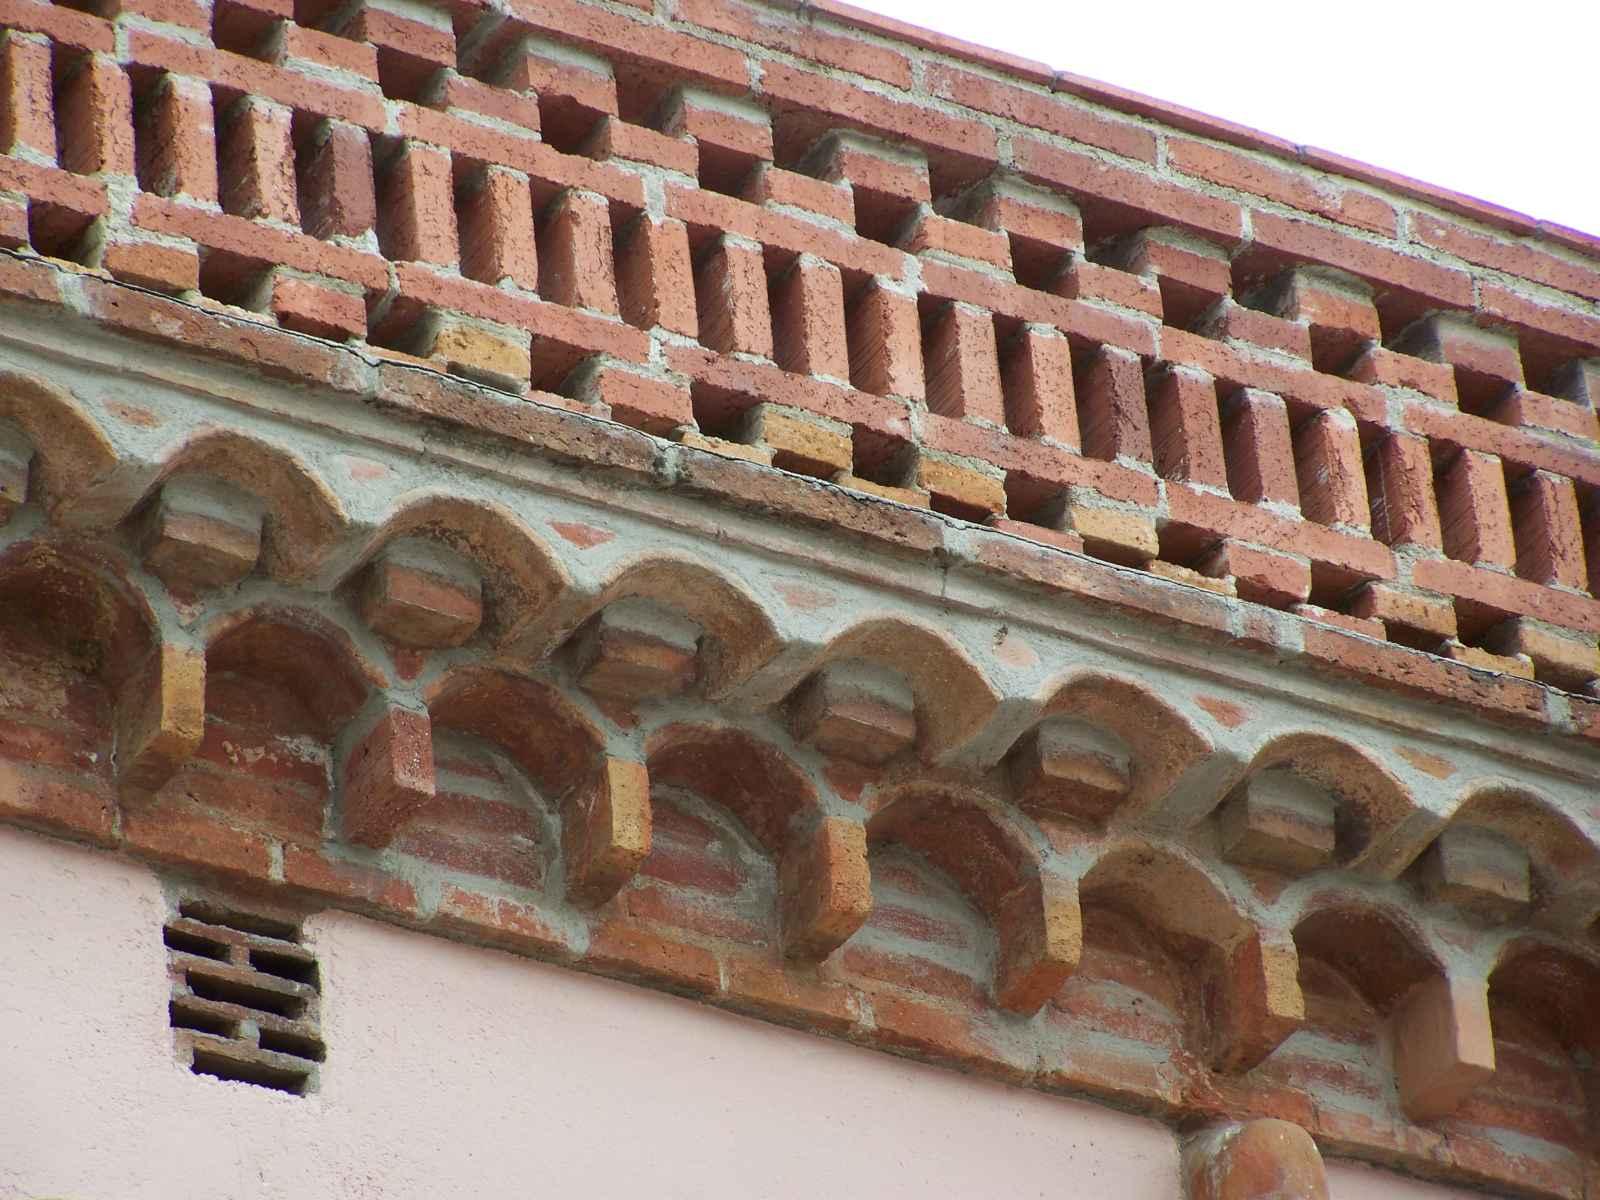 barcelona_2010_1600px_036